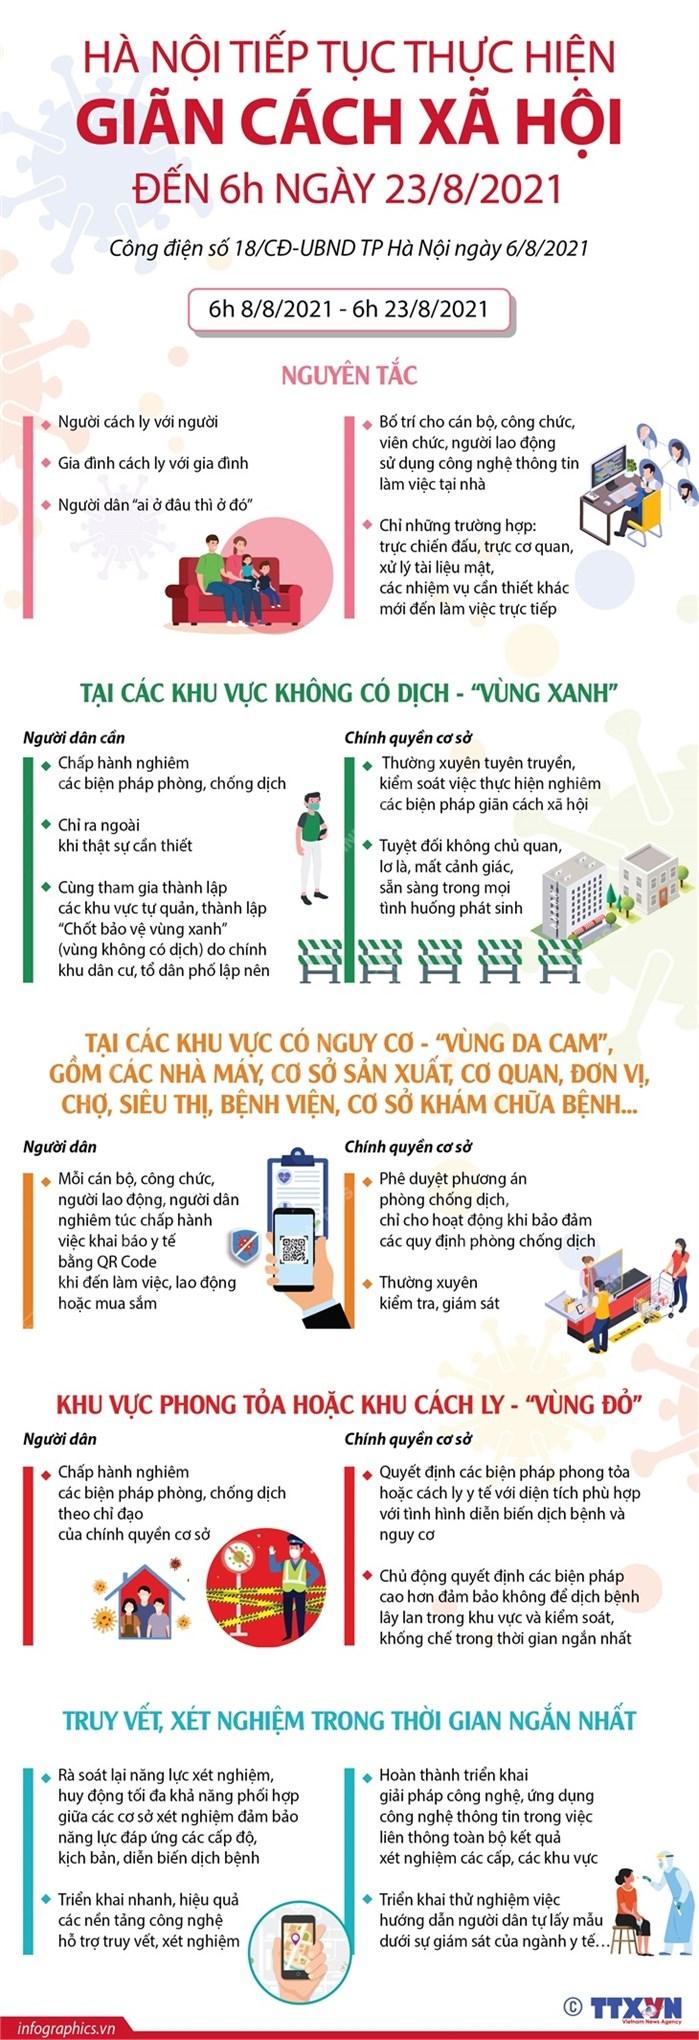 https://vnanet.vn/vi/graphic/suc-khoe-7/ha-noi-tiep-tuc-thuc-hien-gian-cach-xa-hoi-den-6h-ngay-2382021-5597207.html